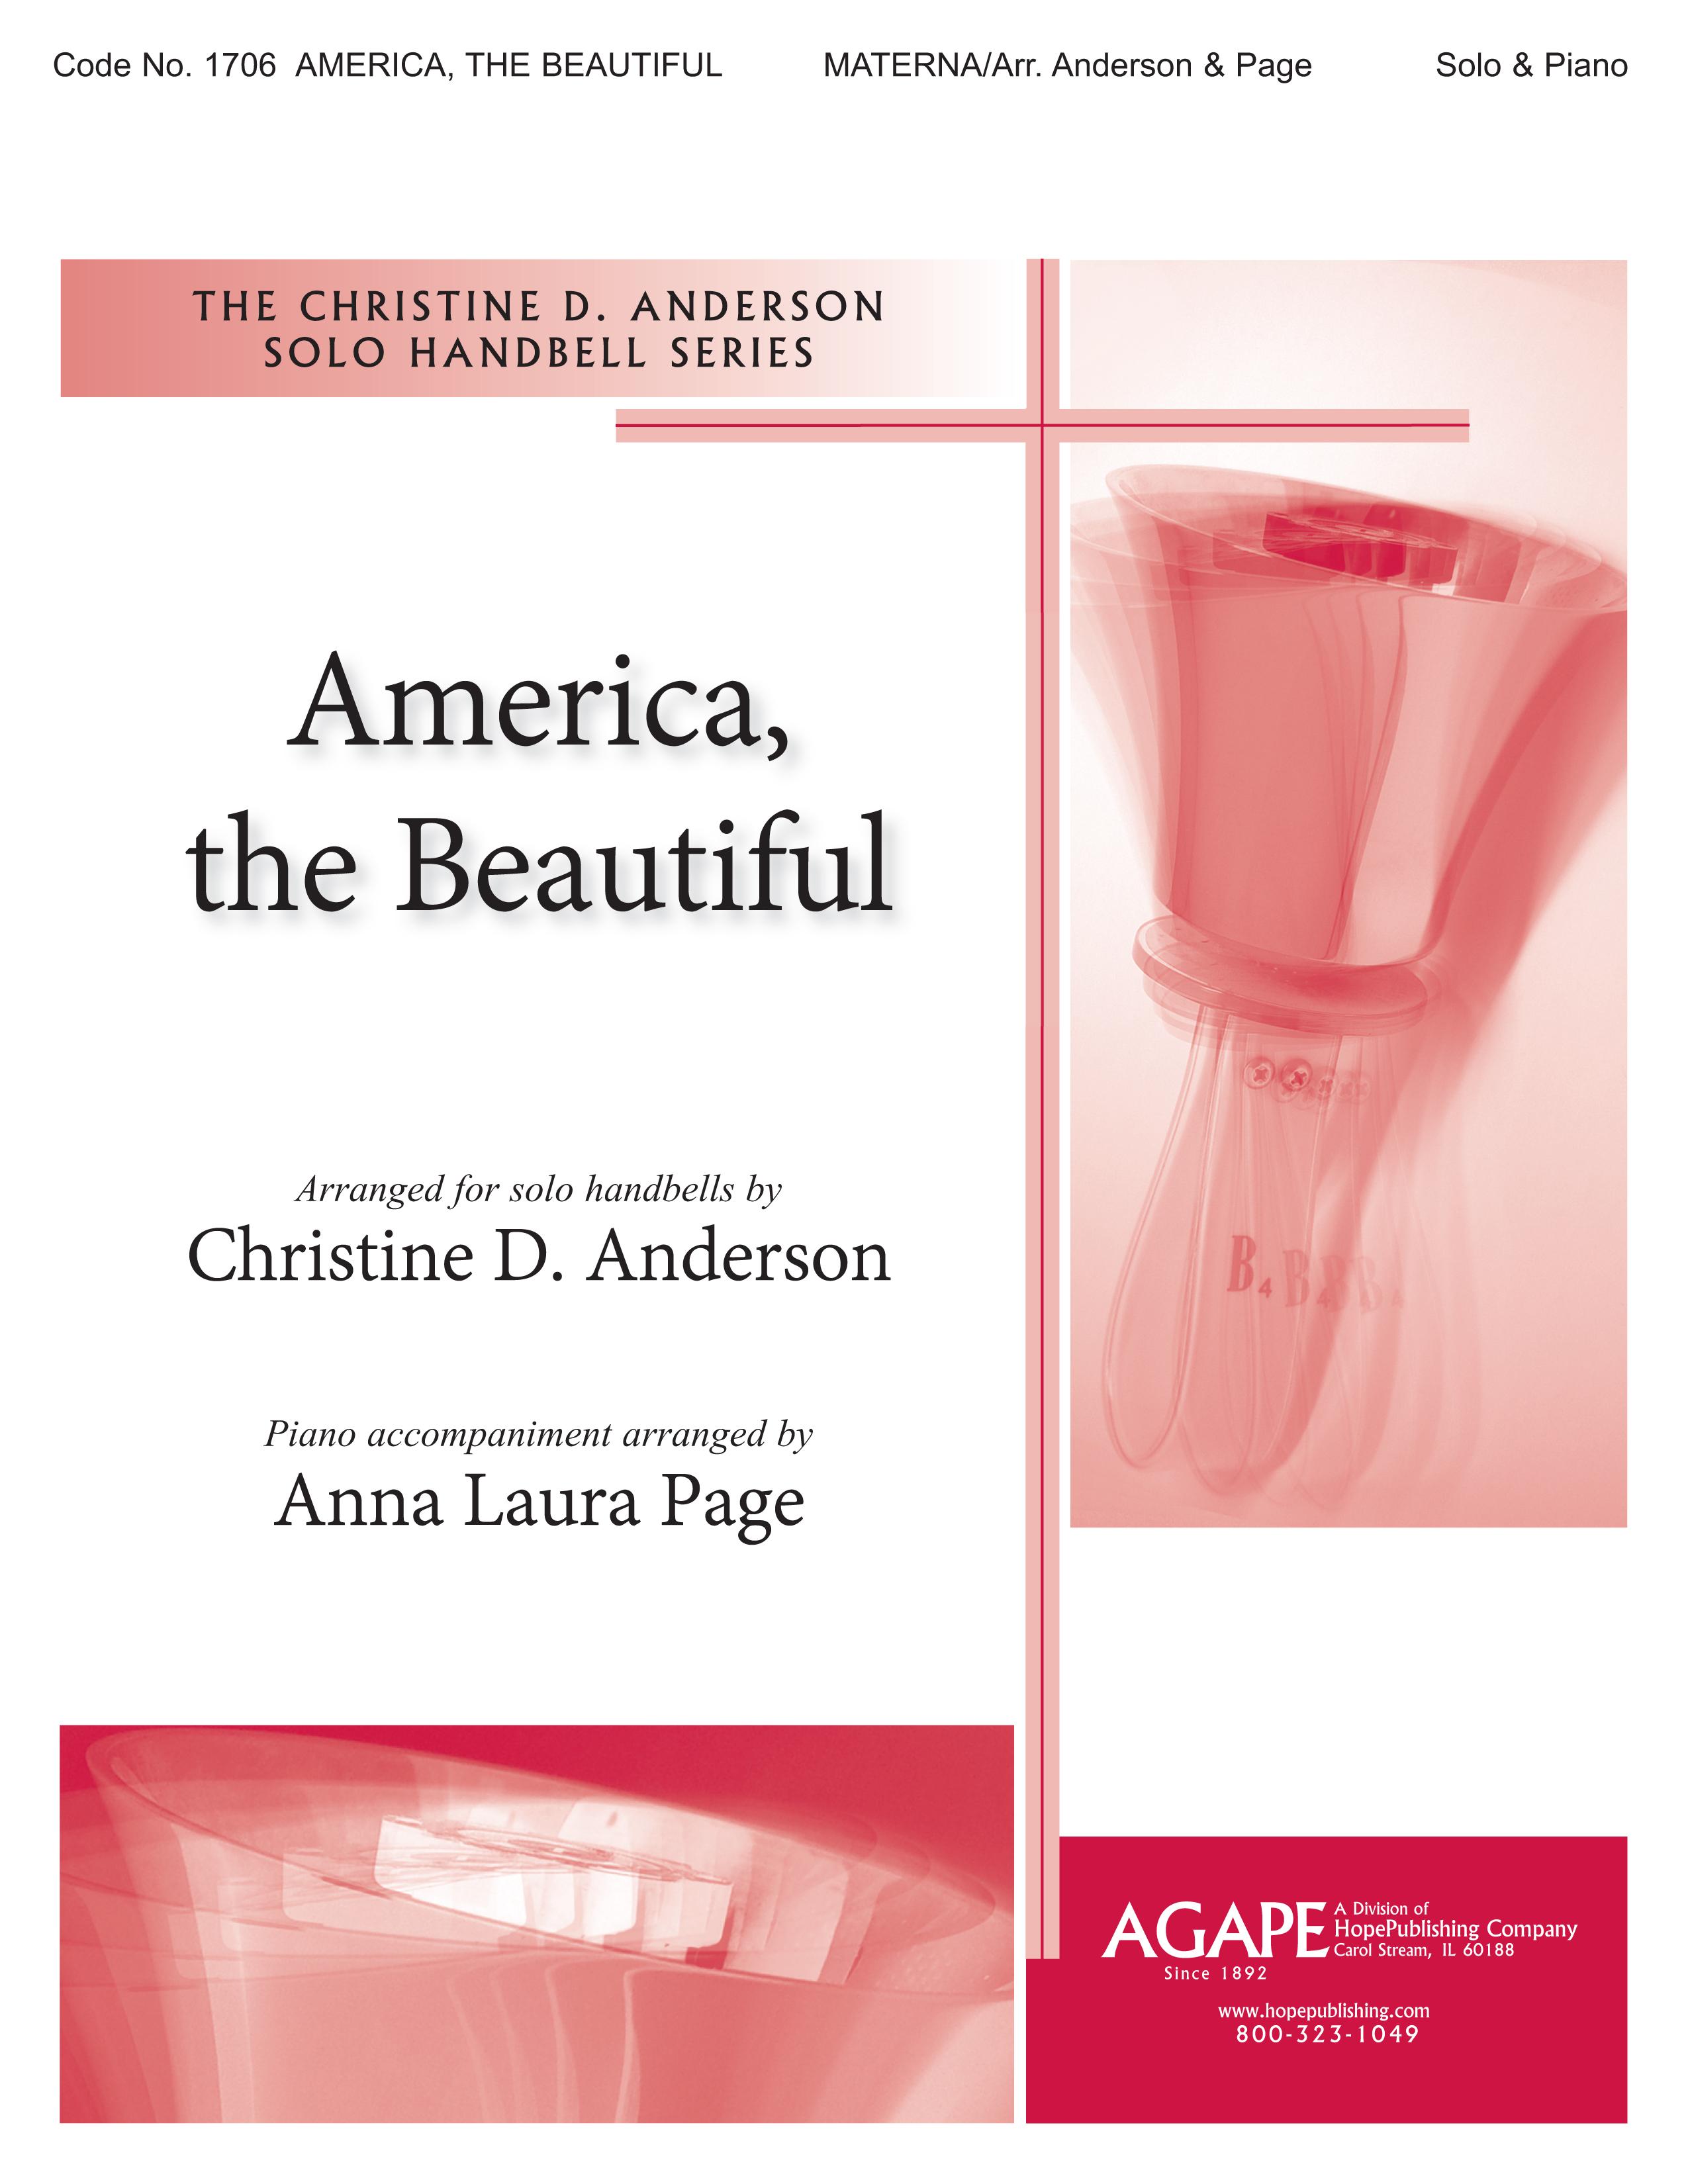 America the Beautiful - Solo Handbell Cover Image